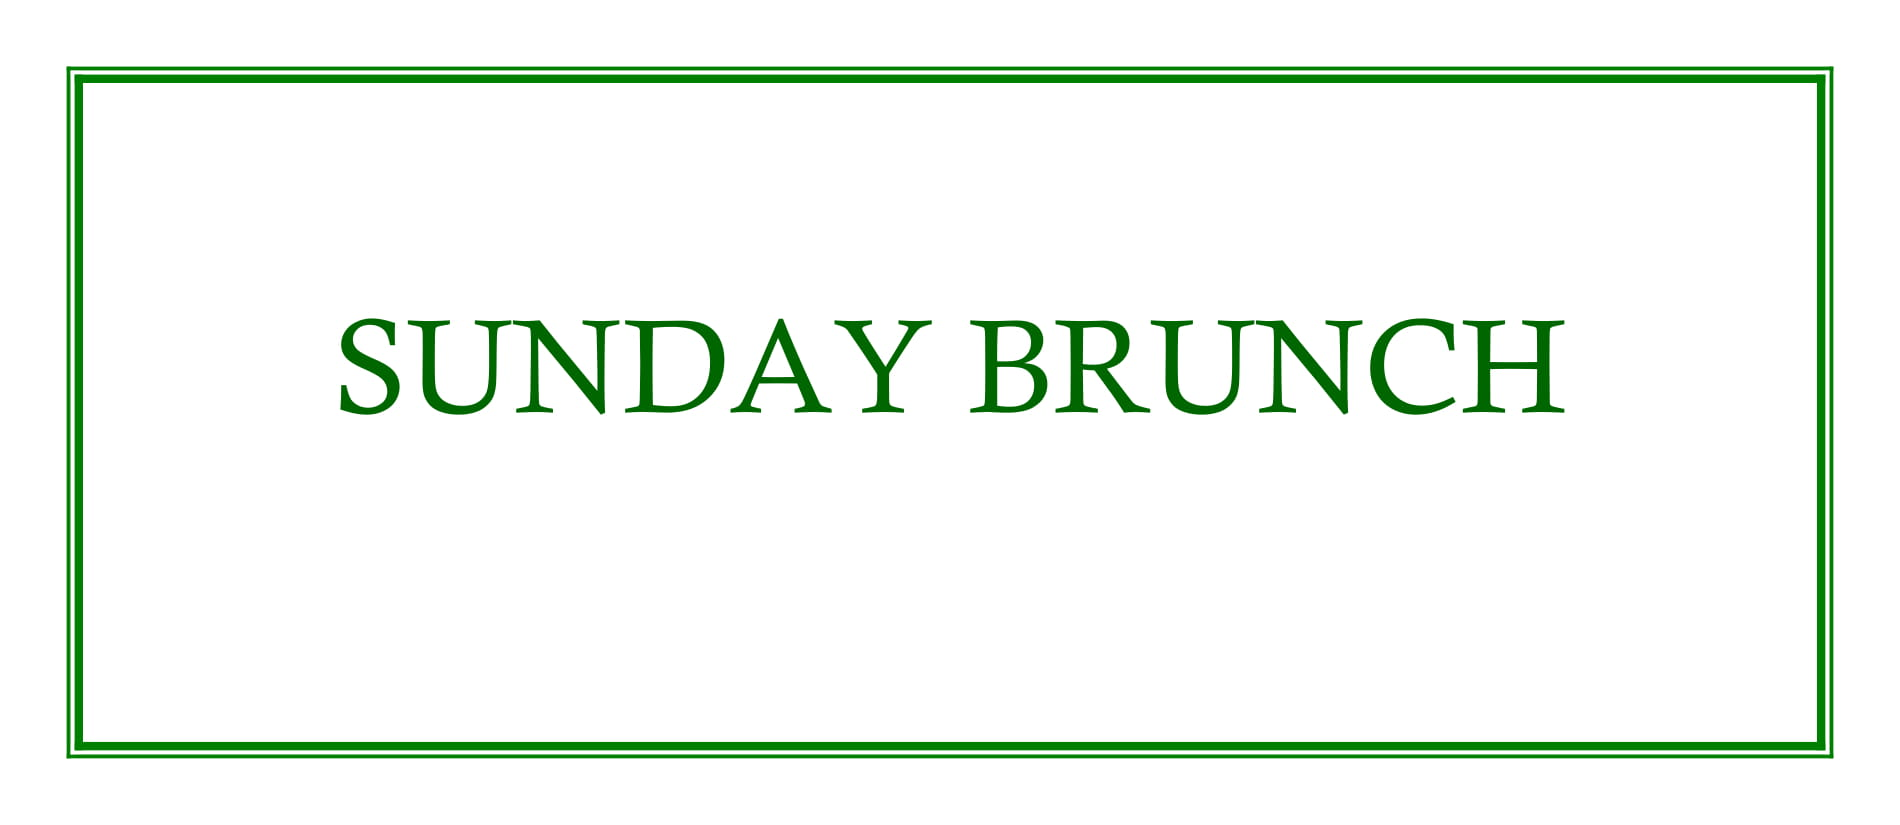 GVL Sunday Brunch Menu